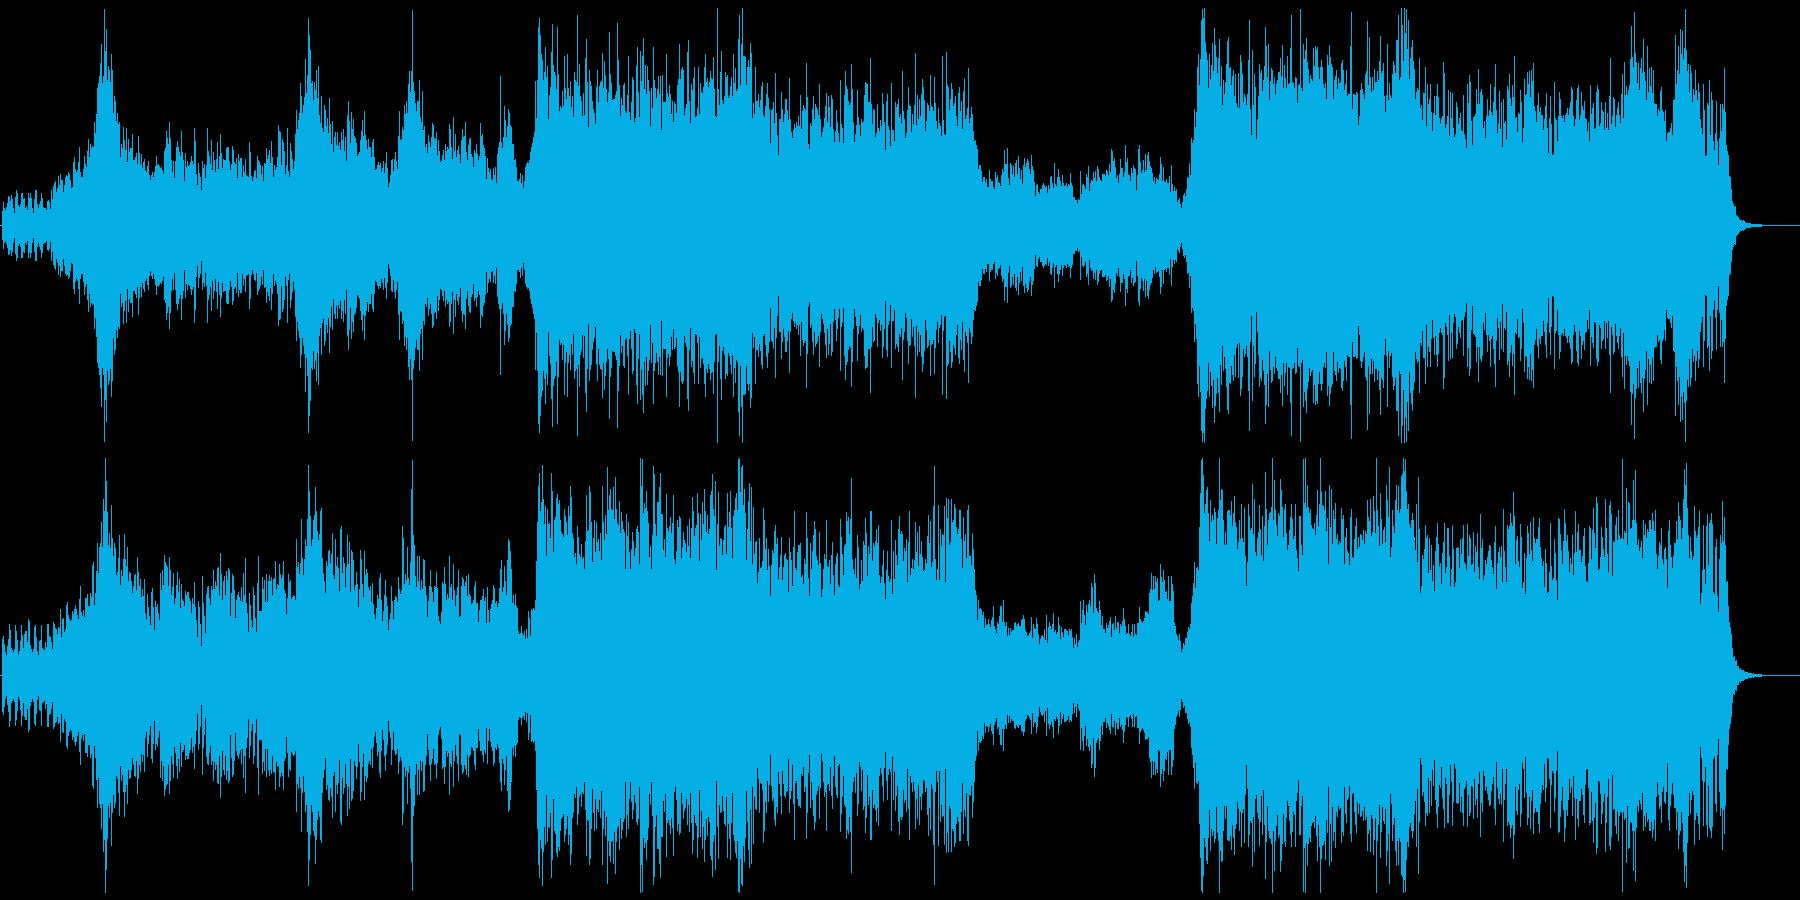 PIRATES ADVENTUREの再生済みの波形